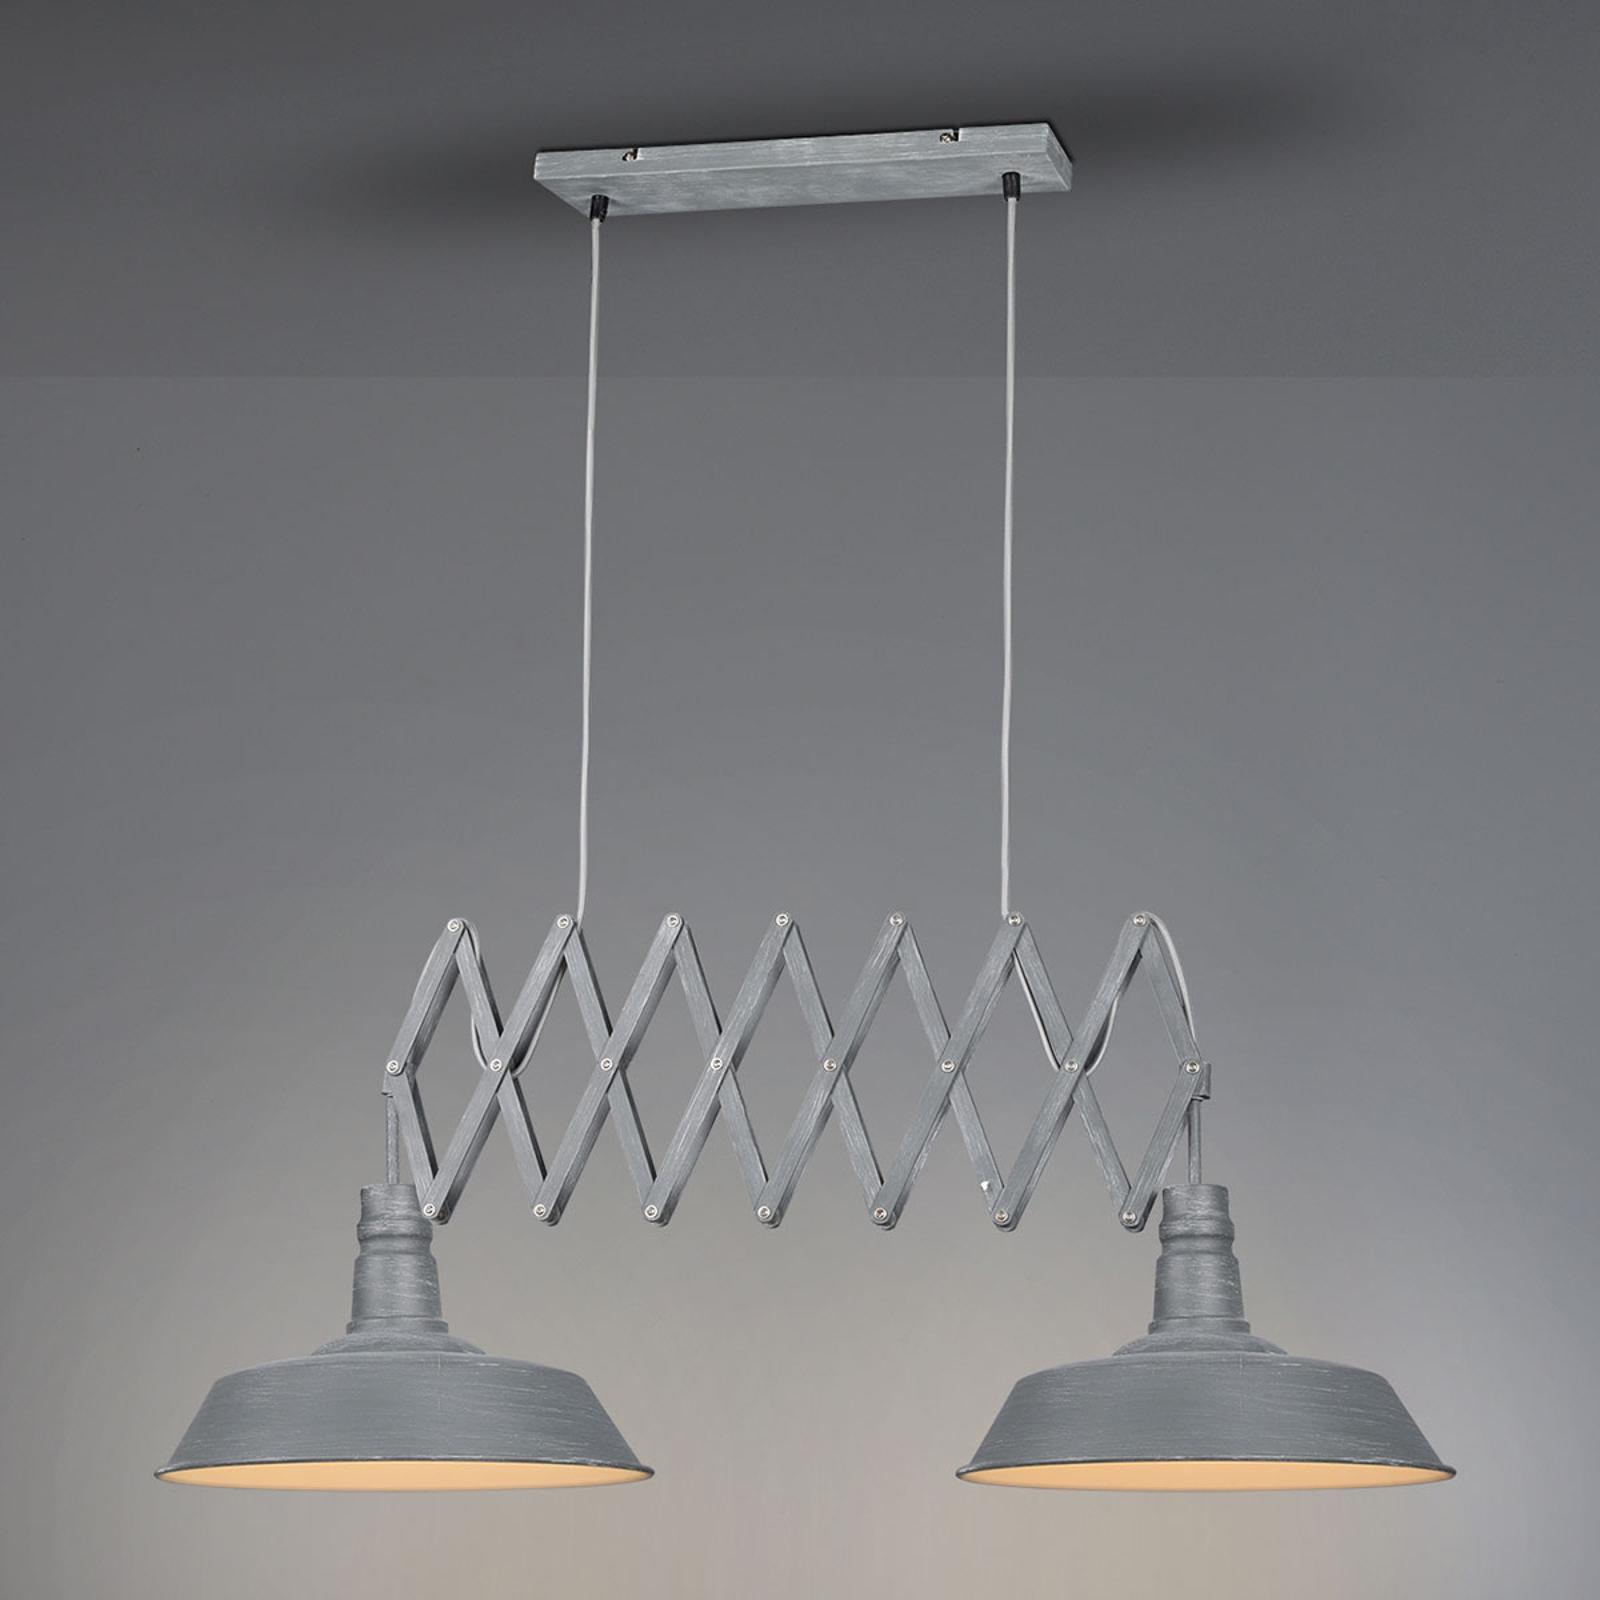 Lampa wisząca Detroit 2-punktowa szarość betonu